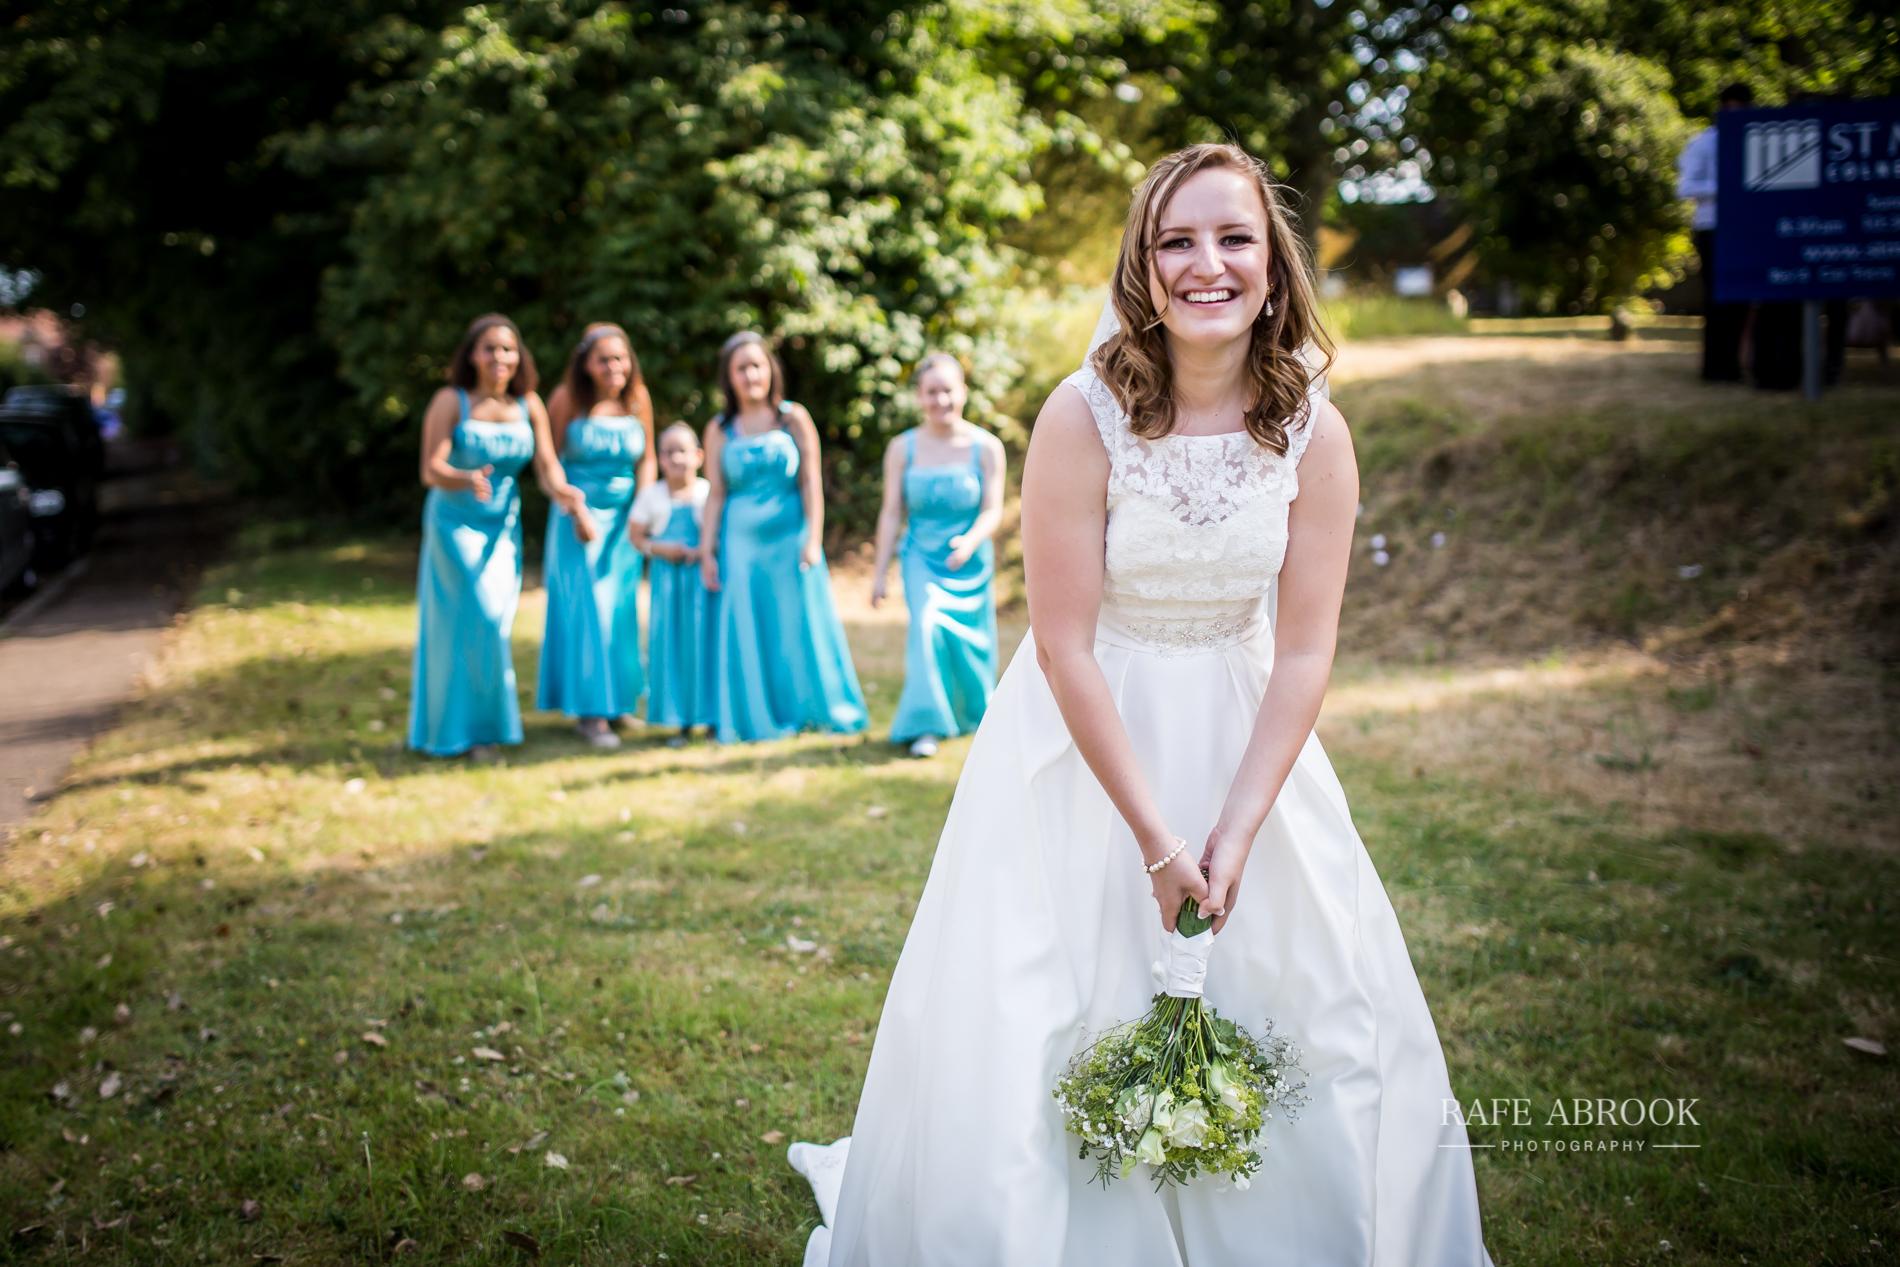 wedding photographer hertfordshire noke thistle hotel st albans -1273.jpg